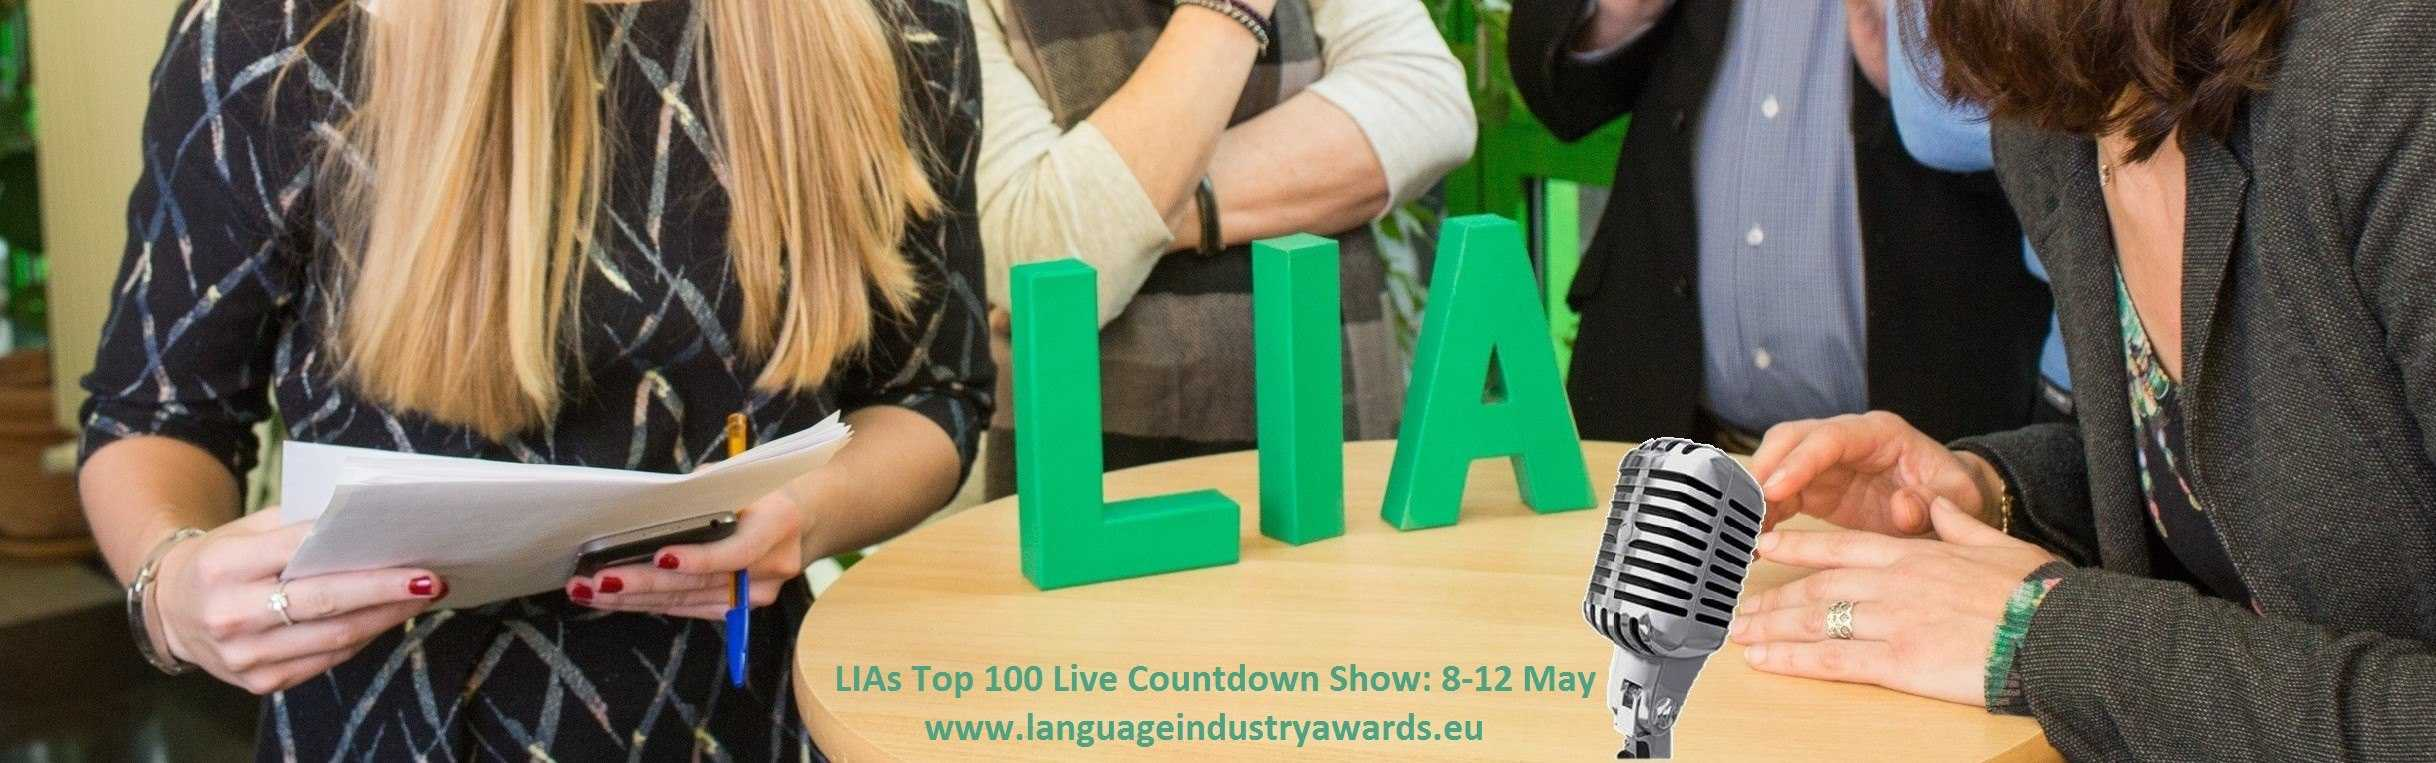 LIAs Top 100 Live Countdown Show